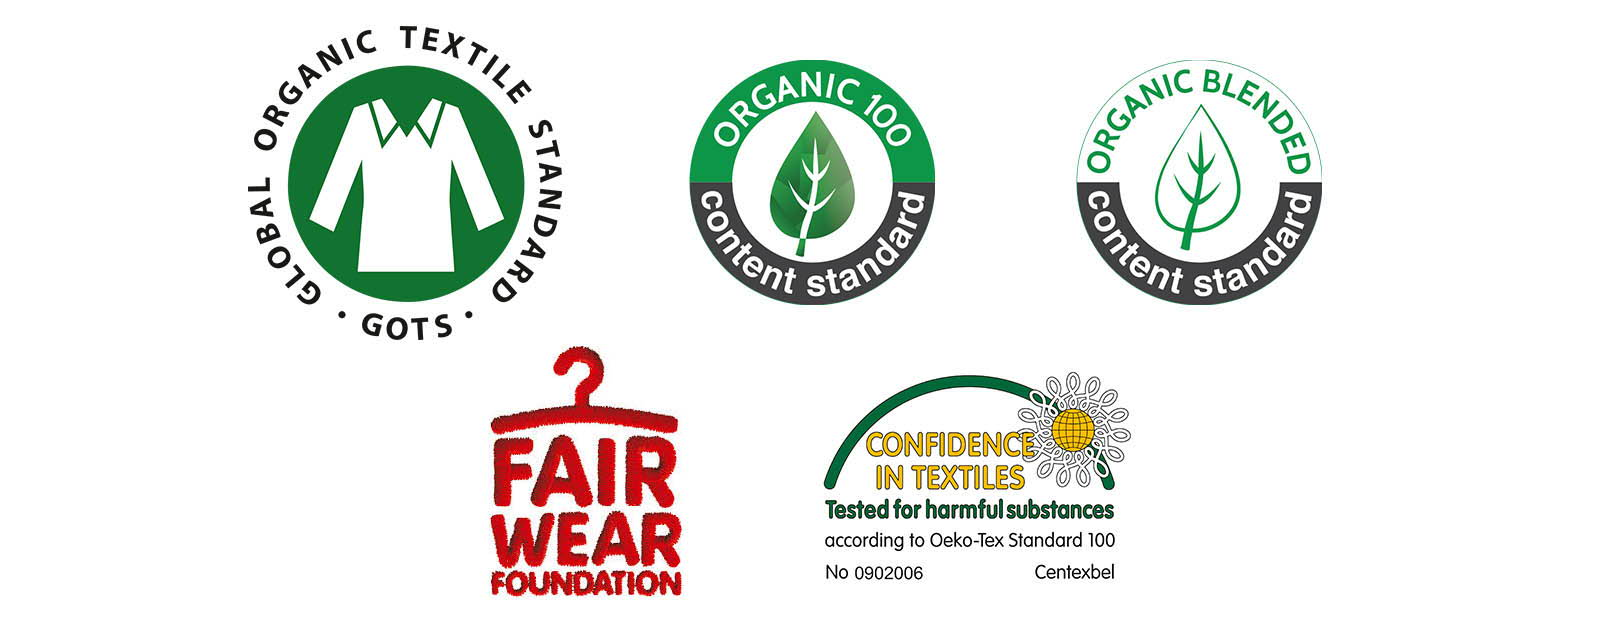 Urban Gilt sustainability certificiations